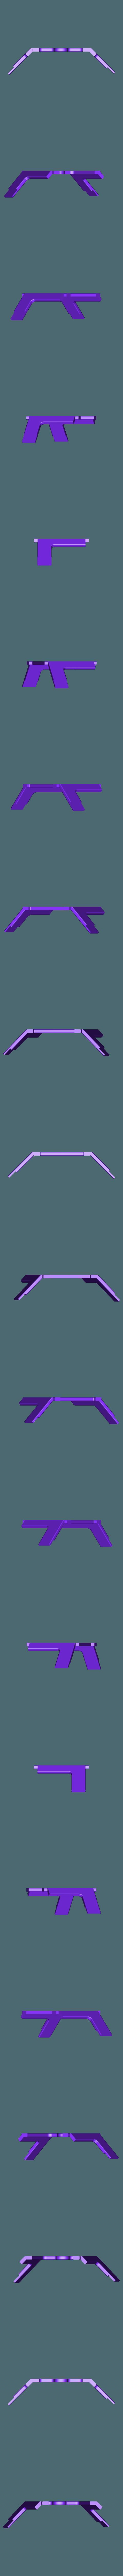 Box_Side-Handle.STL Download free STL file Automata-4 Ben rides around the clock • 3D printer template, woodenclocks